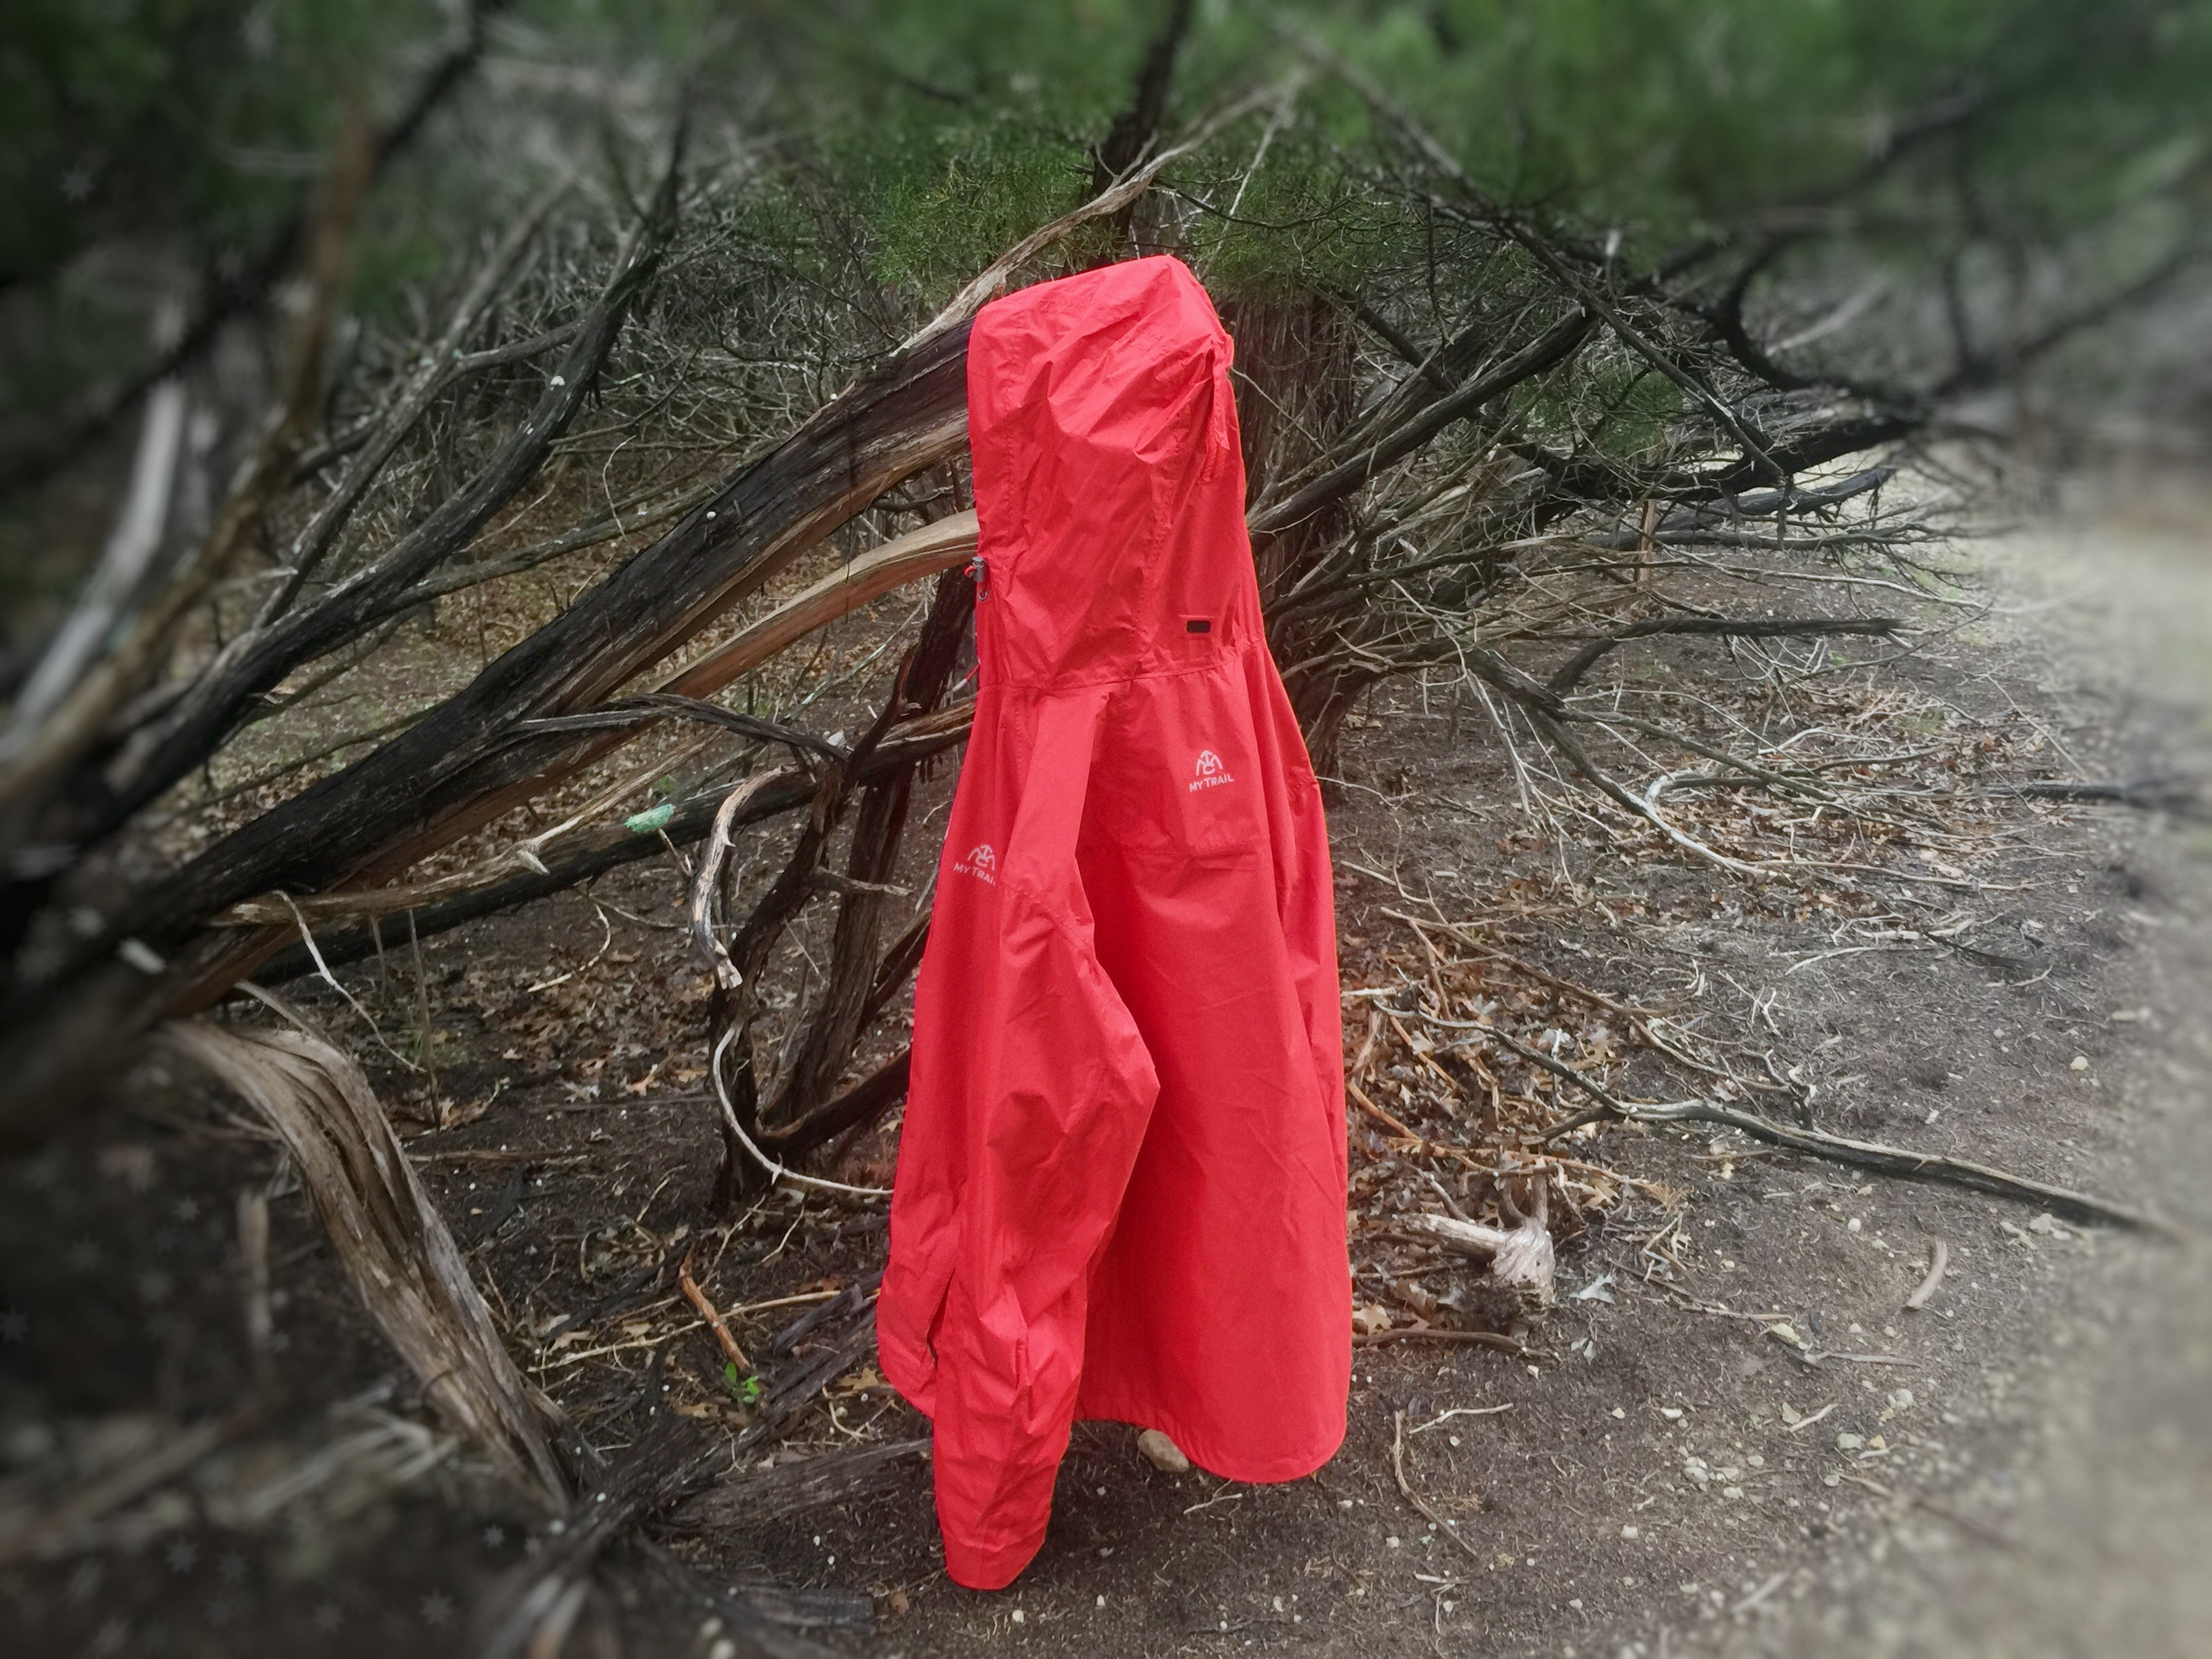 My Trail Storm UL Rain Jacket